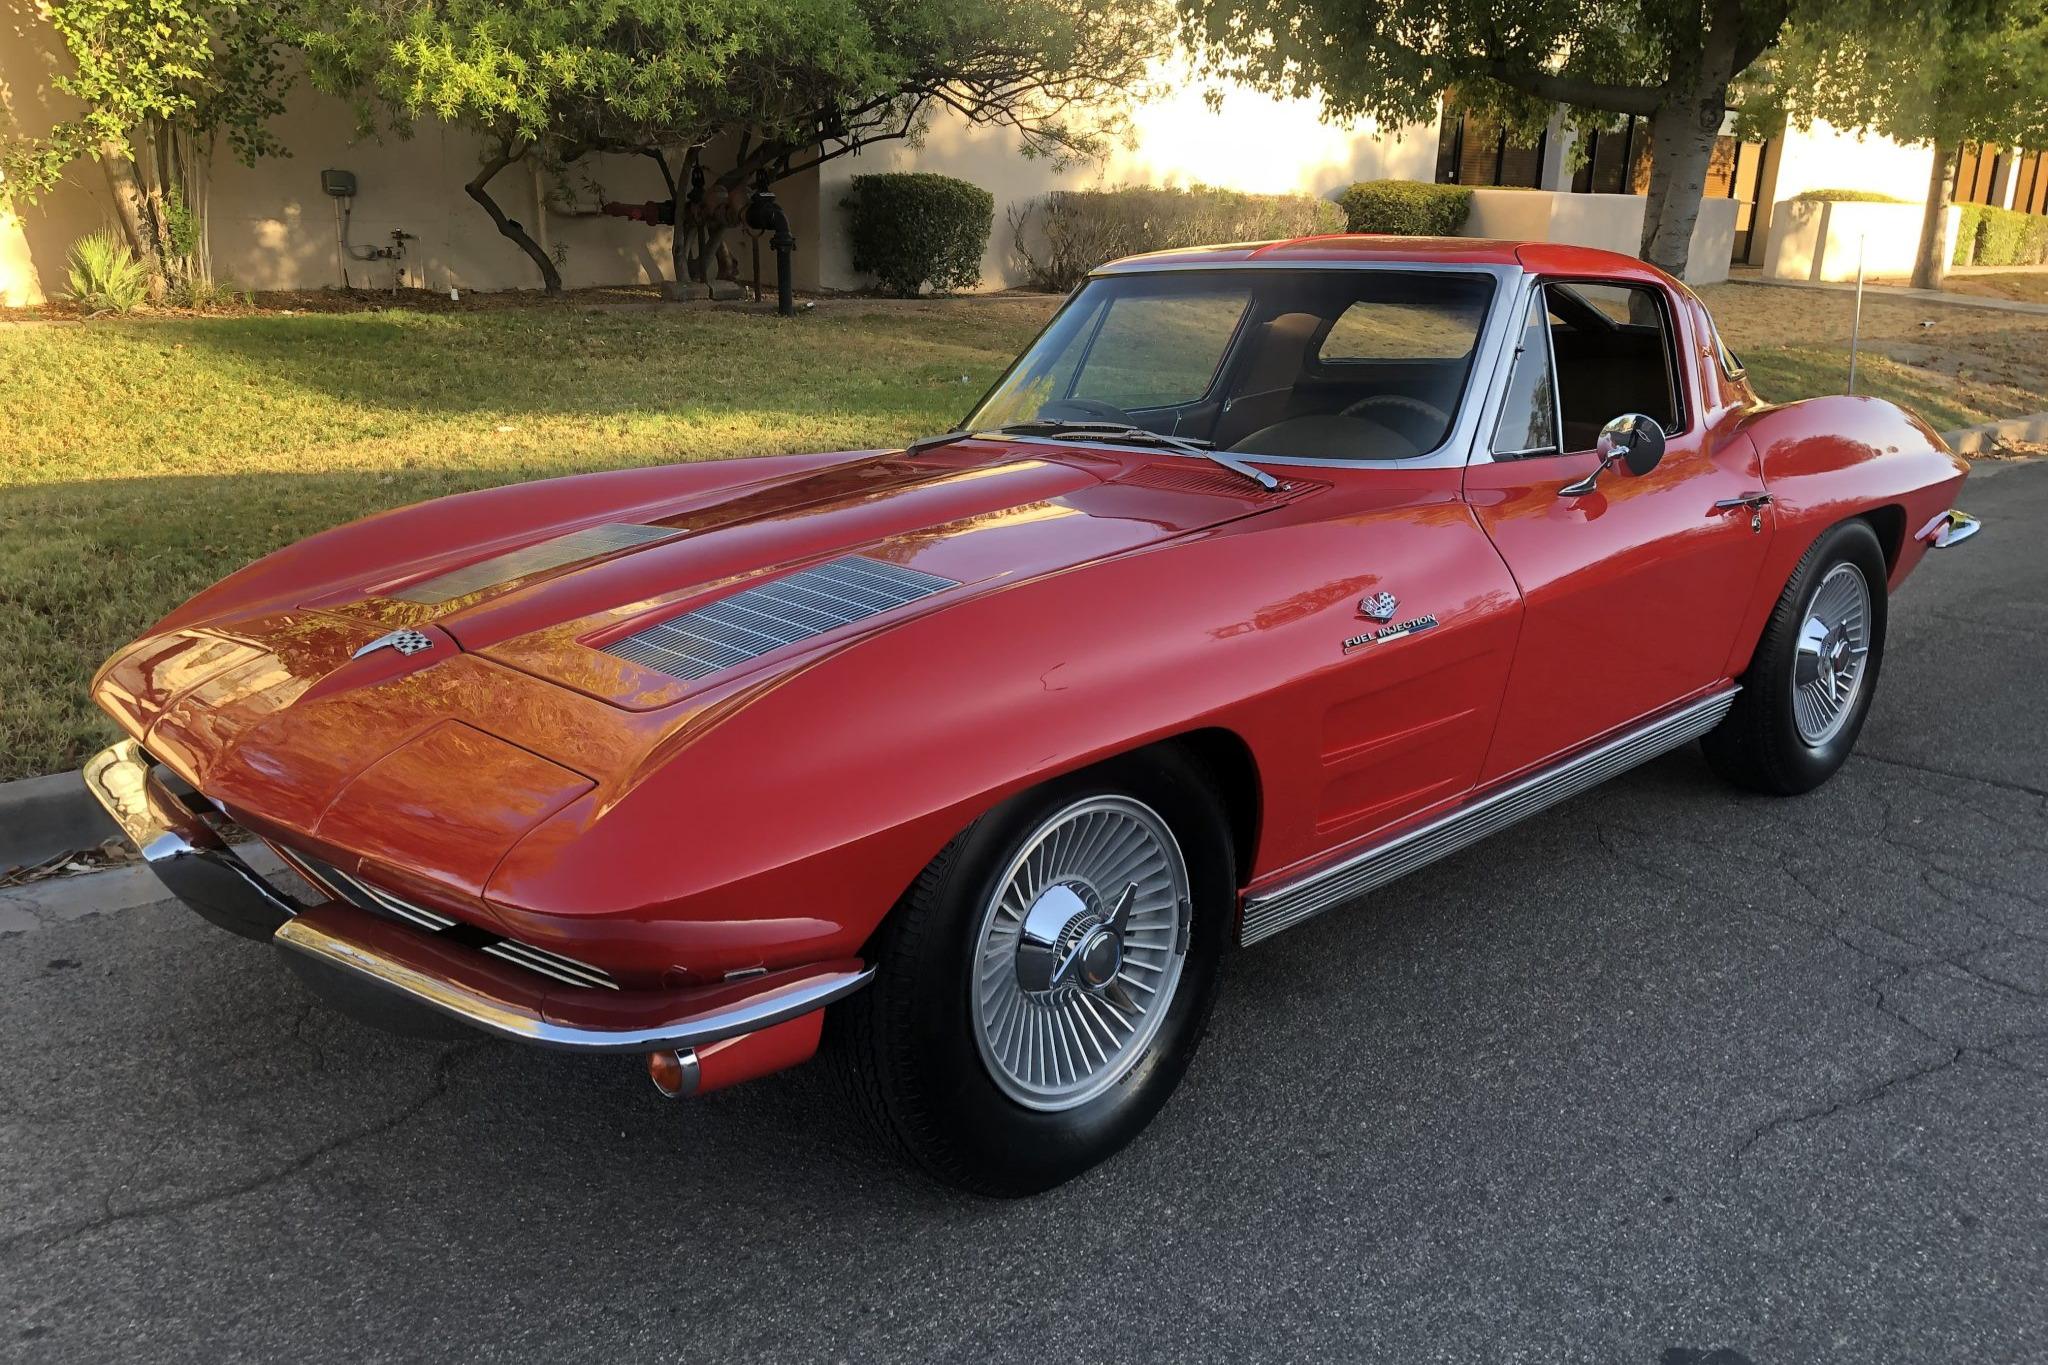 Red 1963 Corvette